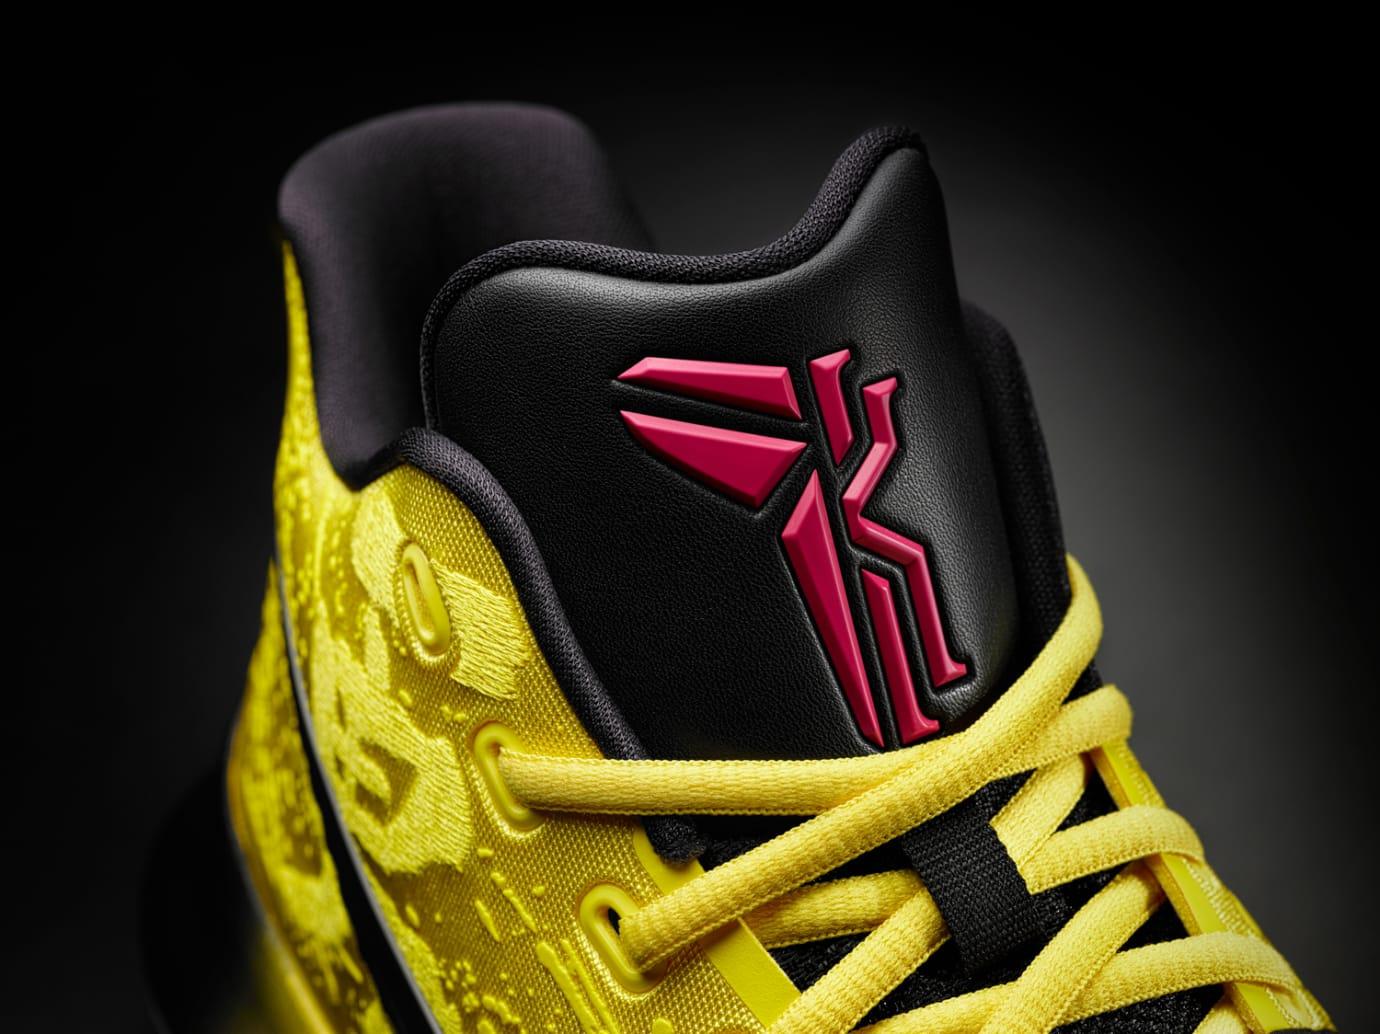 Nike Kyrie 3 Mamba Mentality Bruce Lee Tongue